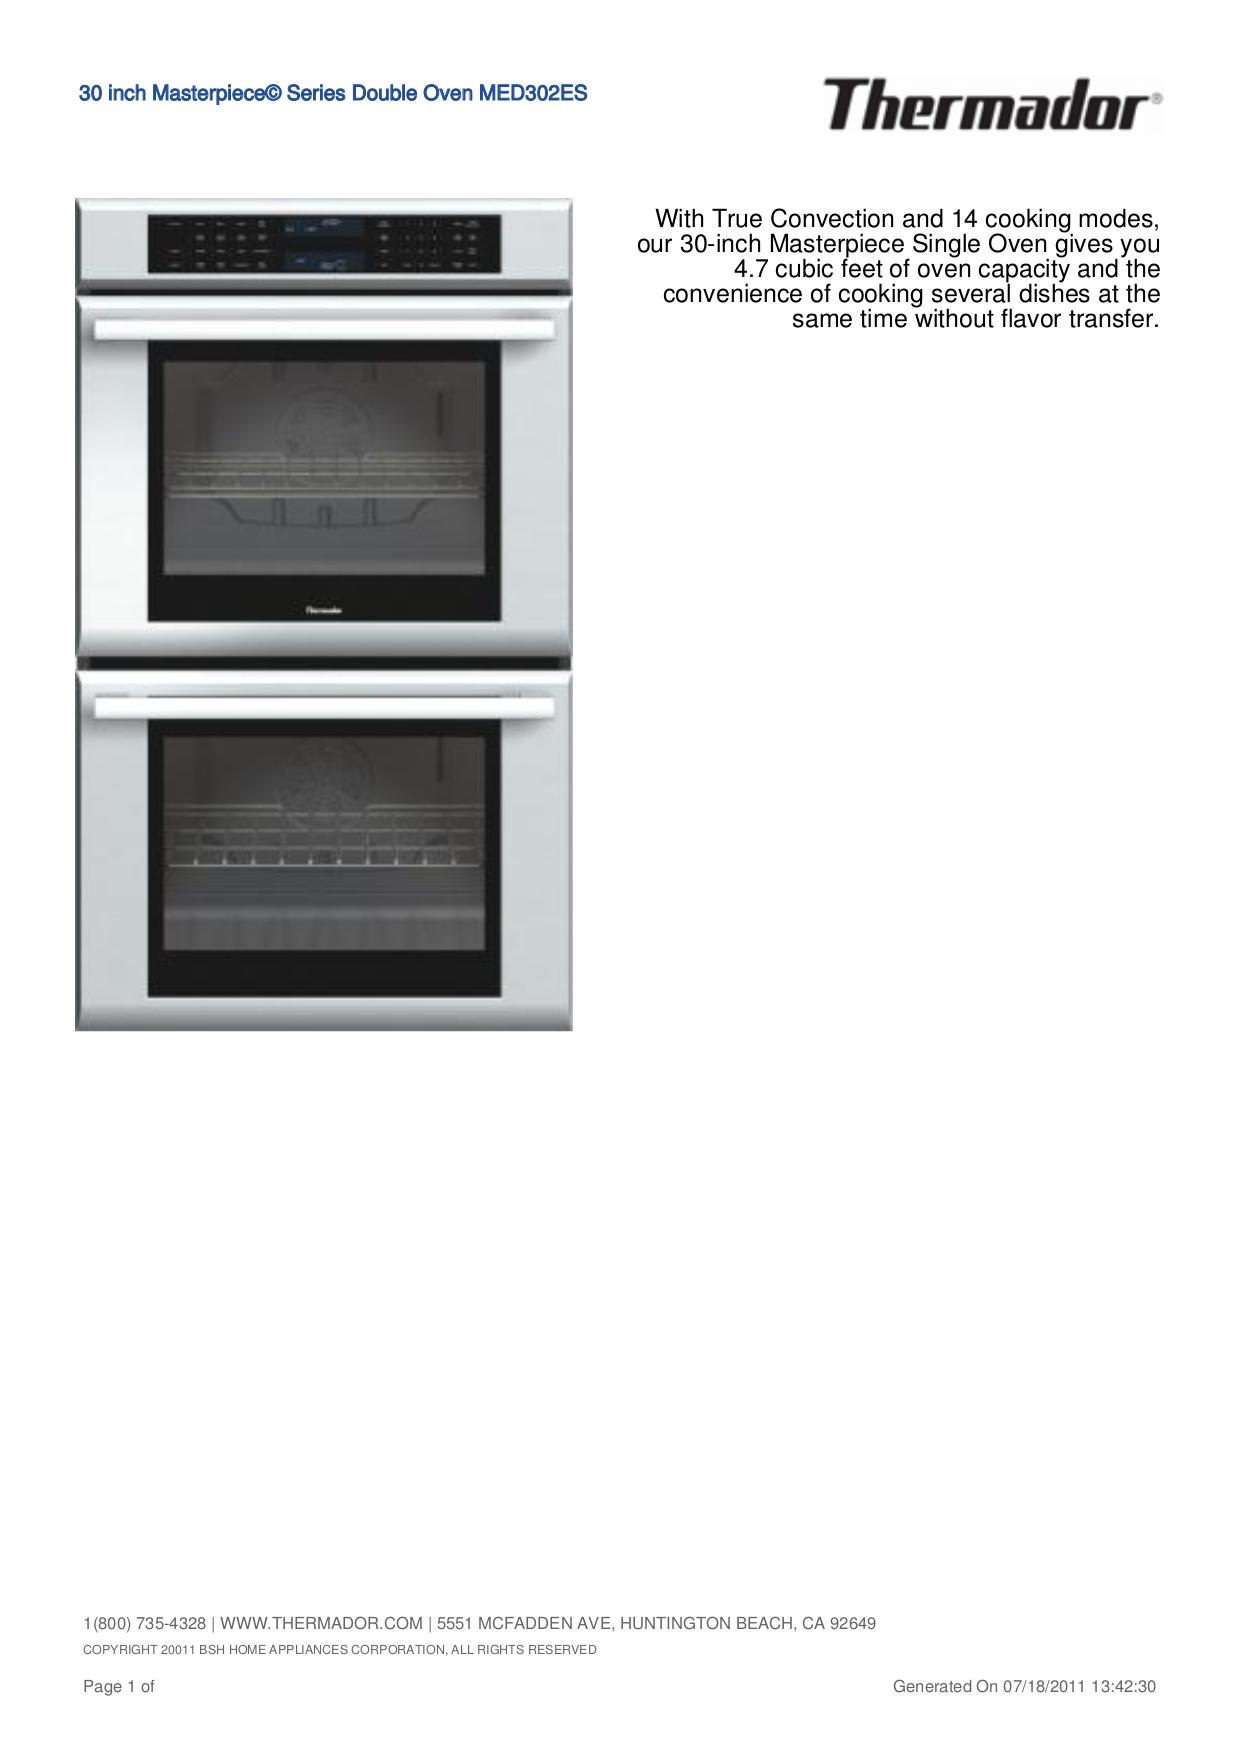 download free pdf for thermador med302es oven manual rh umlib com thermador professional oven manual thermador oven manual ct230